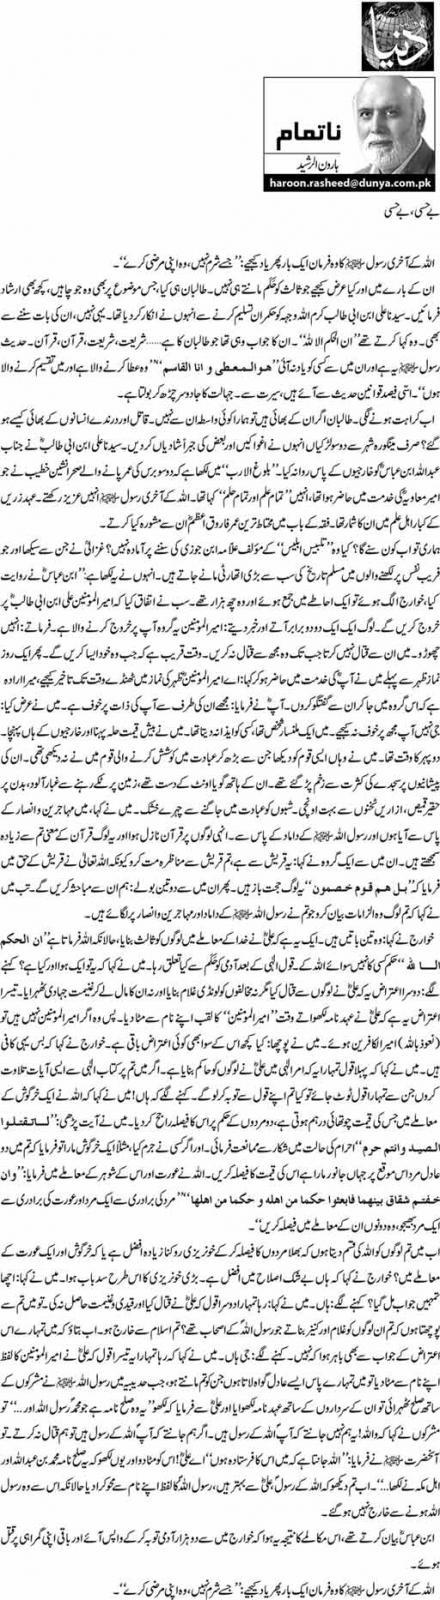 taliban-kharji.jpg